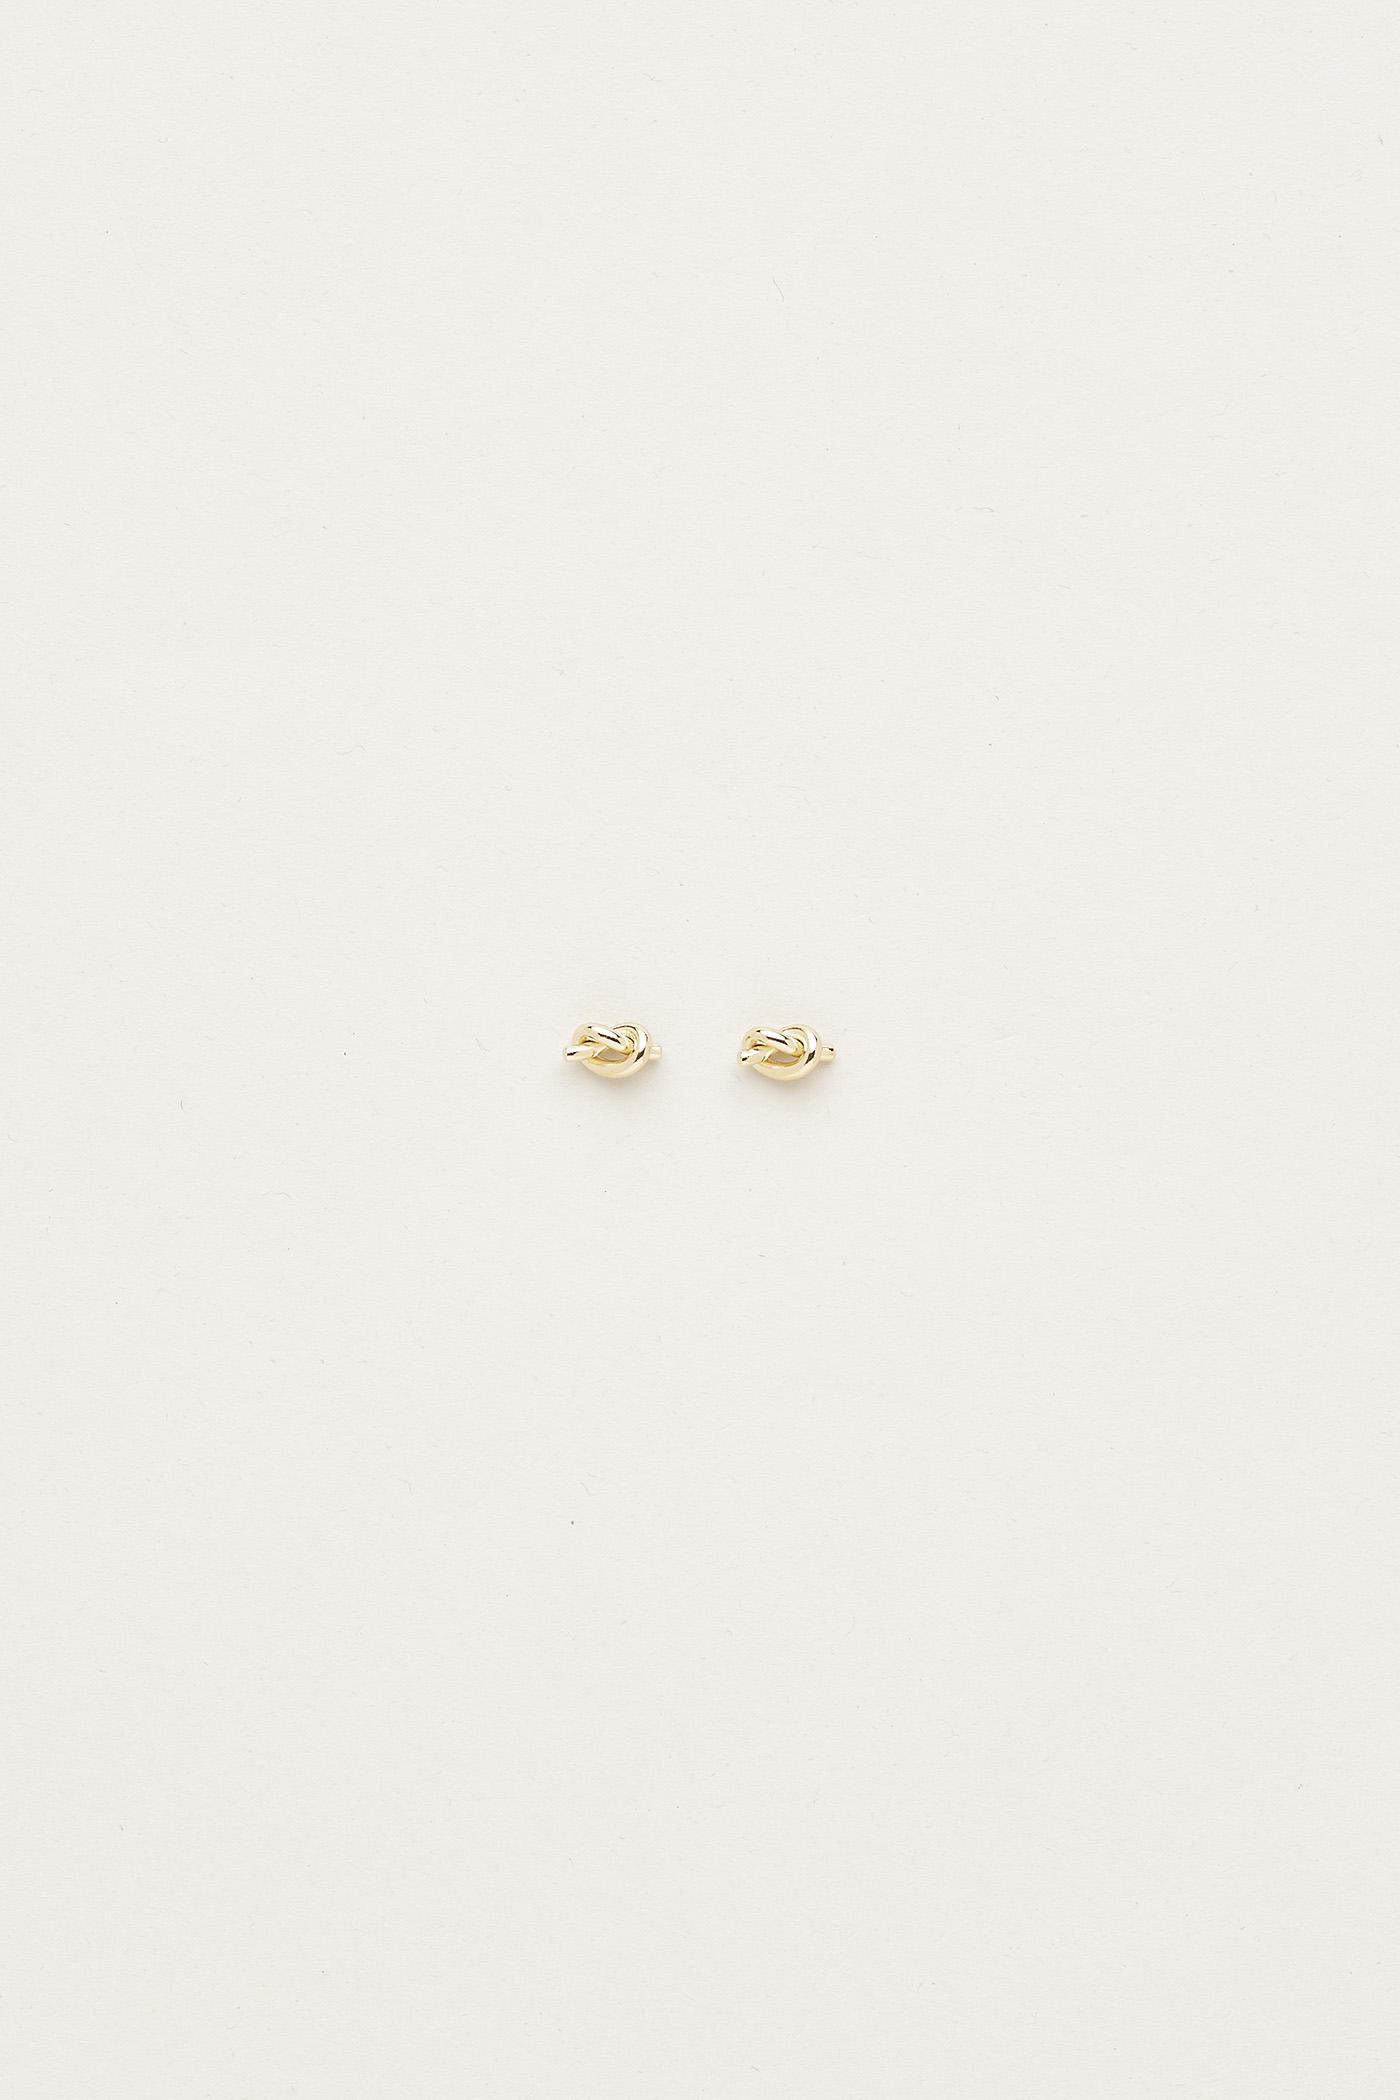 Tavia Knot Ear Studs